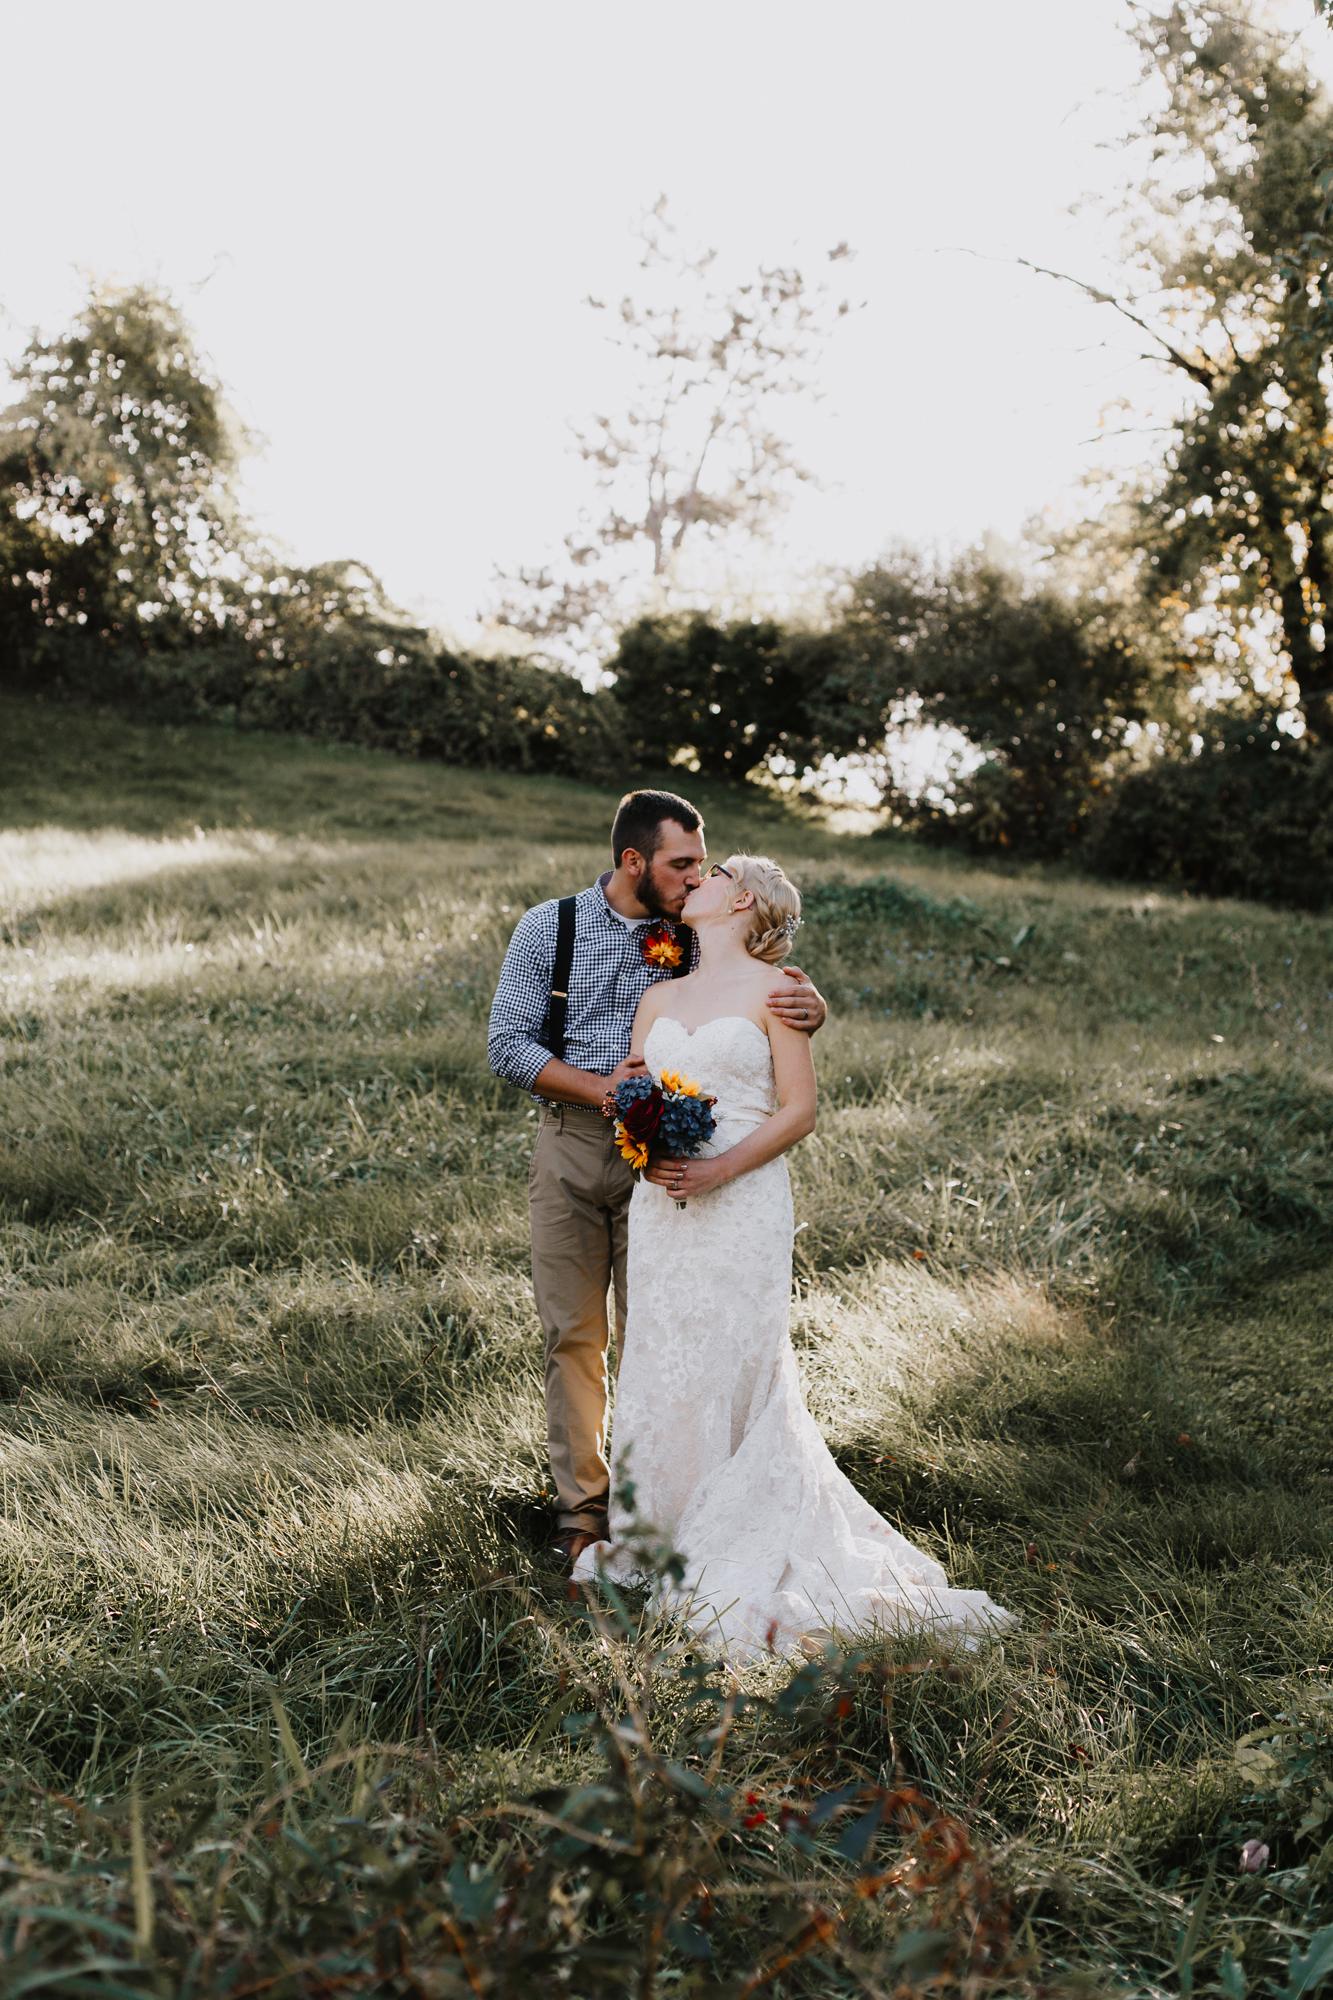 the-farm-at-beiber-drive-muncy-pa-wedding-photo